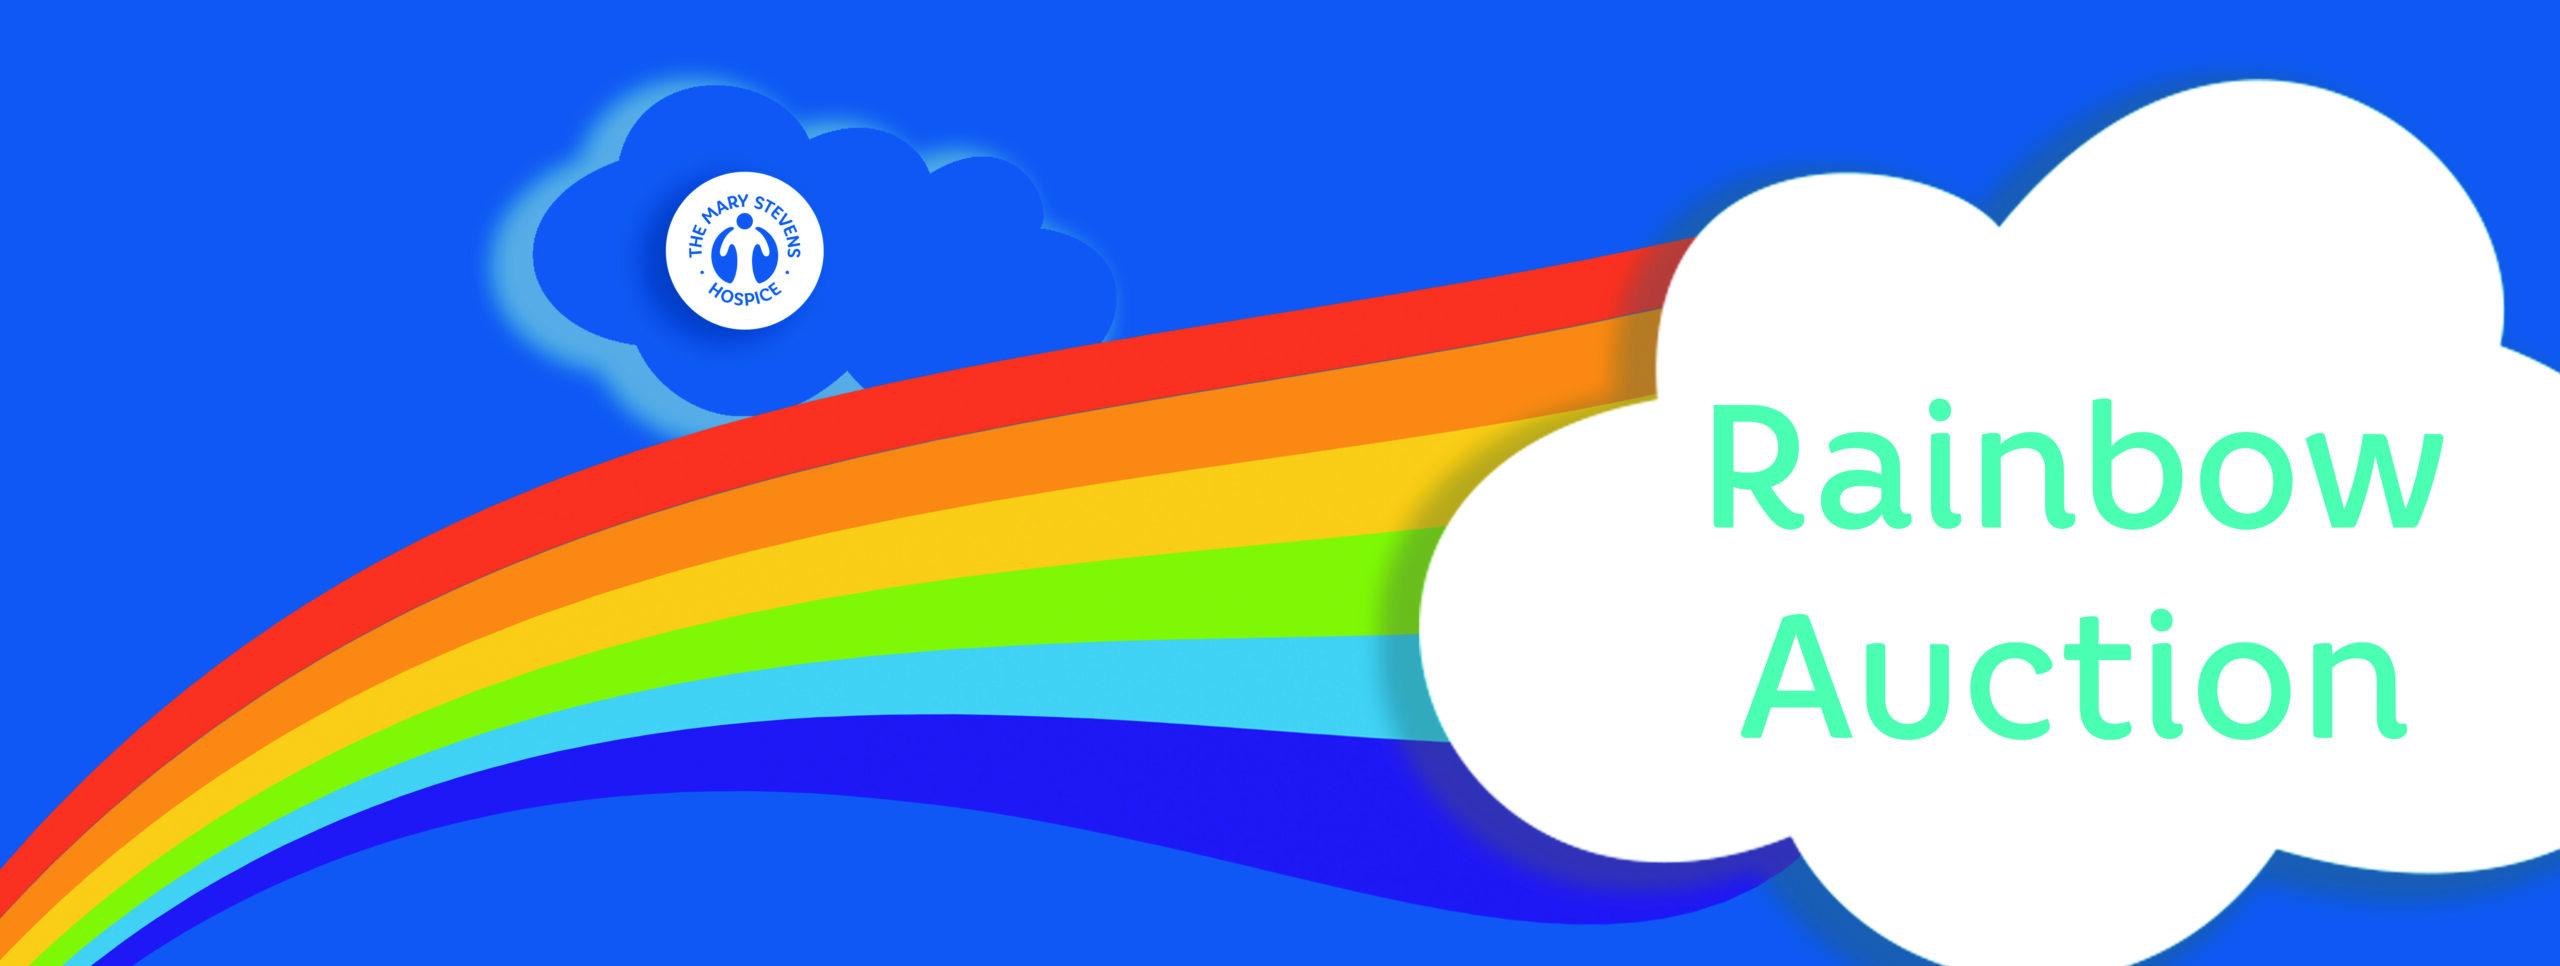 Rainbow Auction Banner